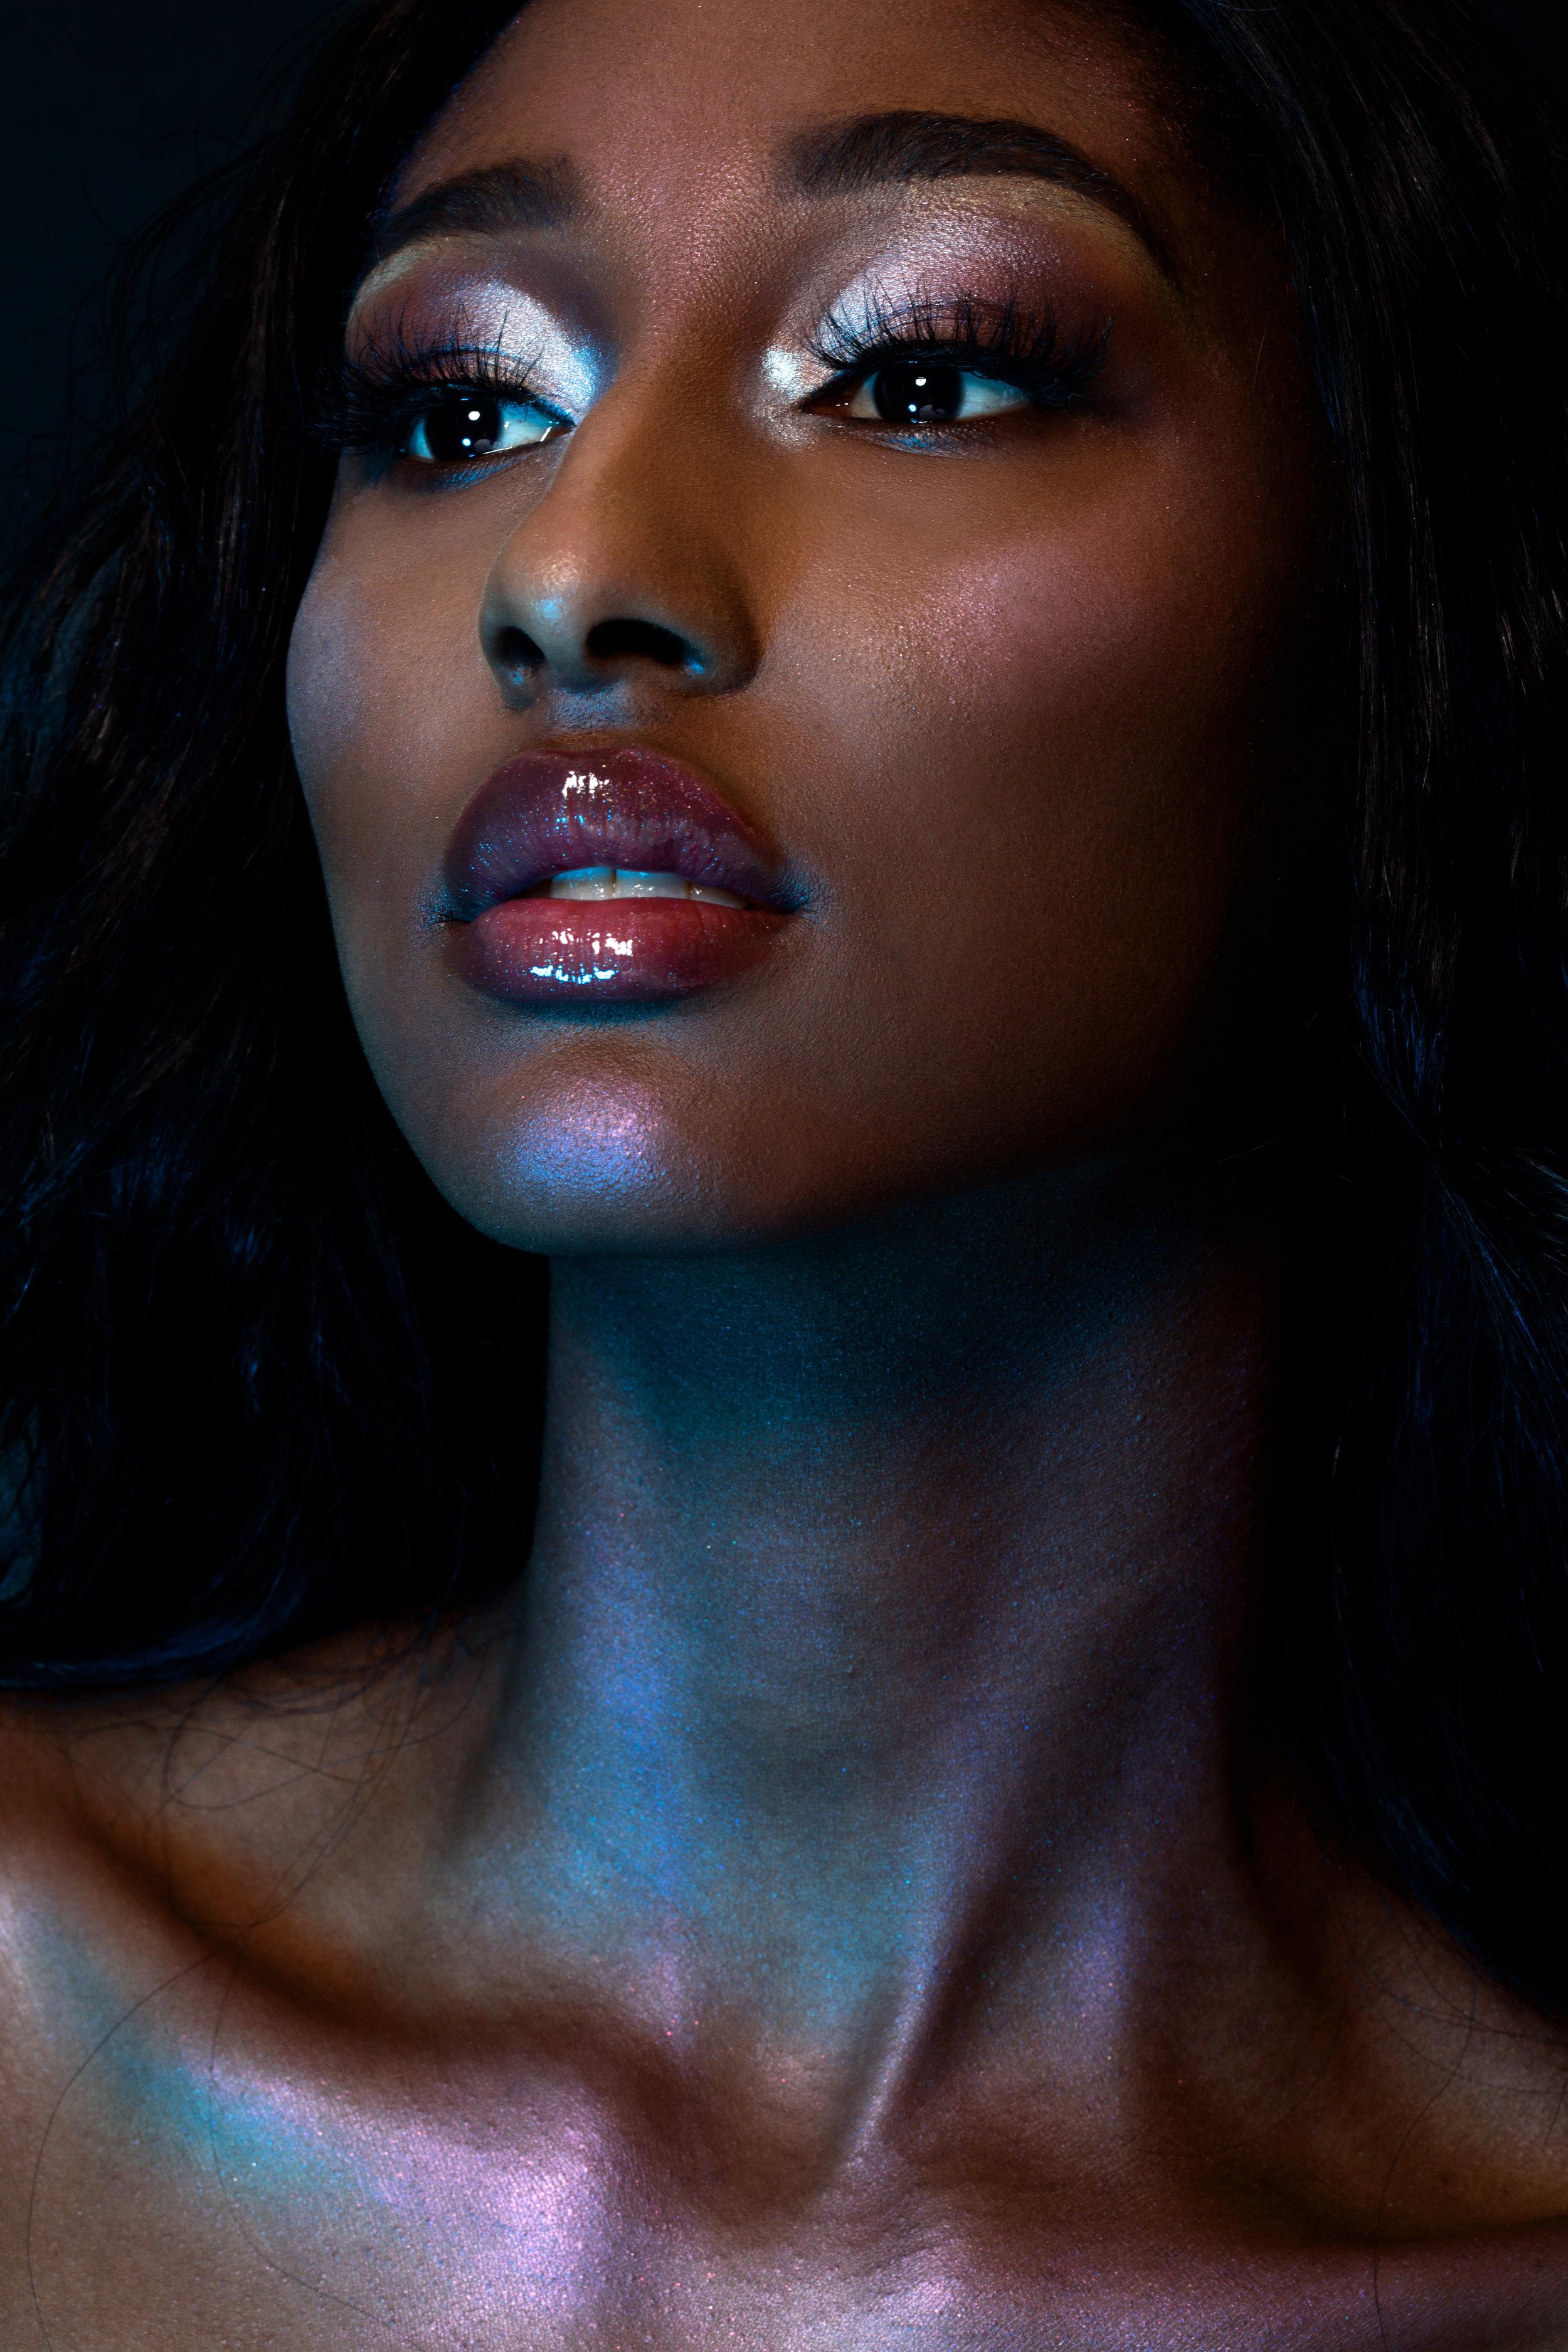 anastasia beverly hills highlighter makeup look